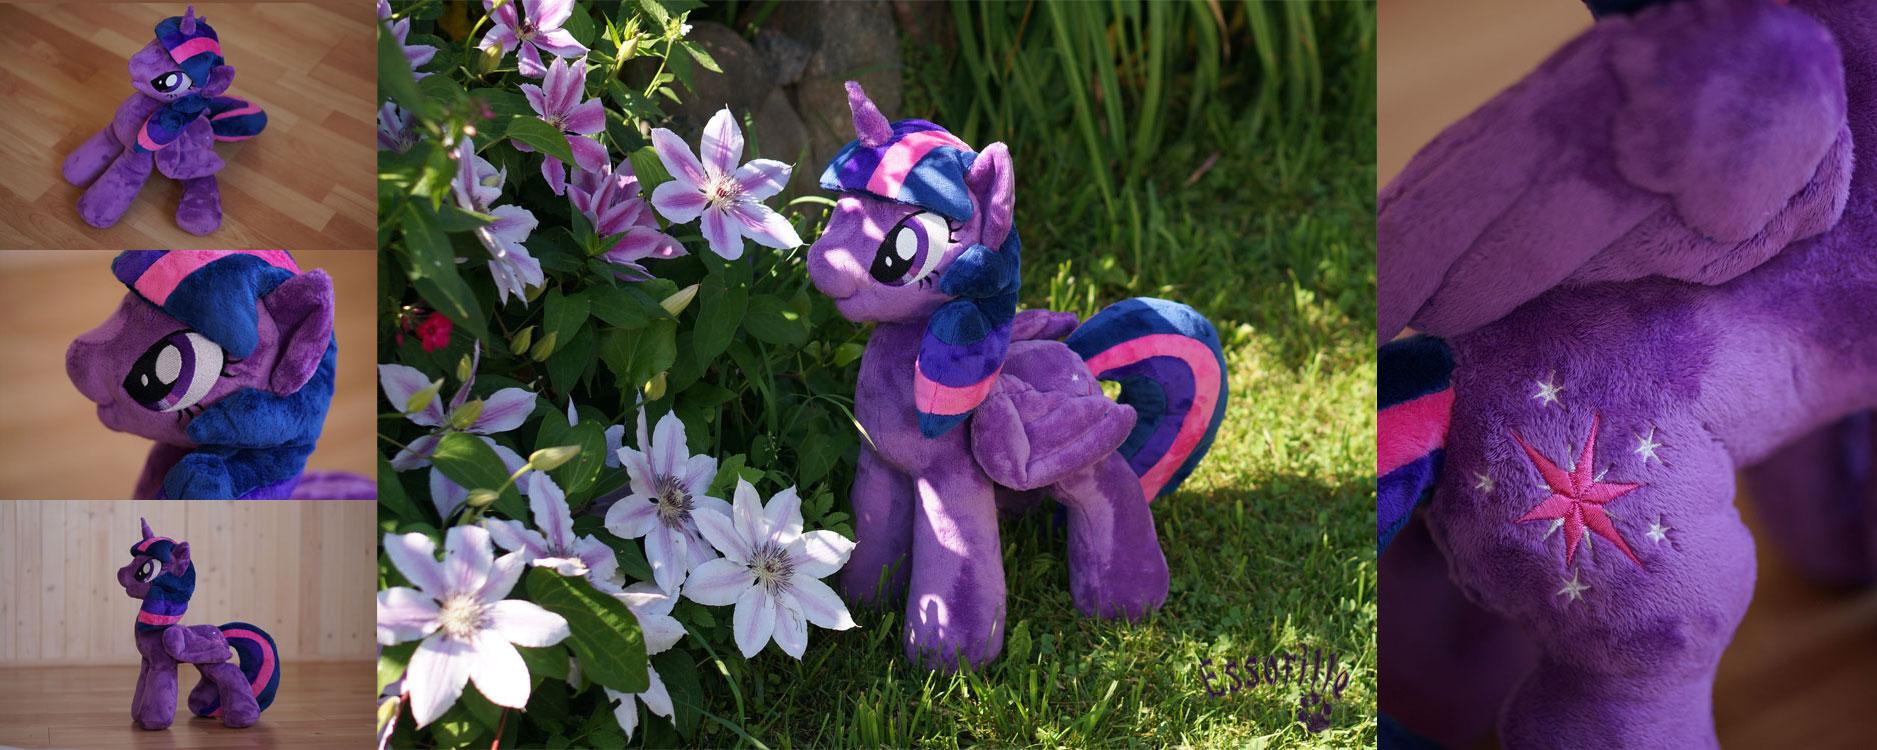 Twilight Sparkle, Twilicorn by Essorille